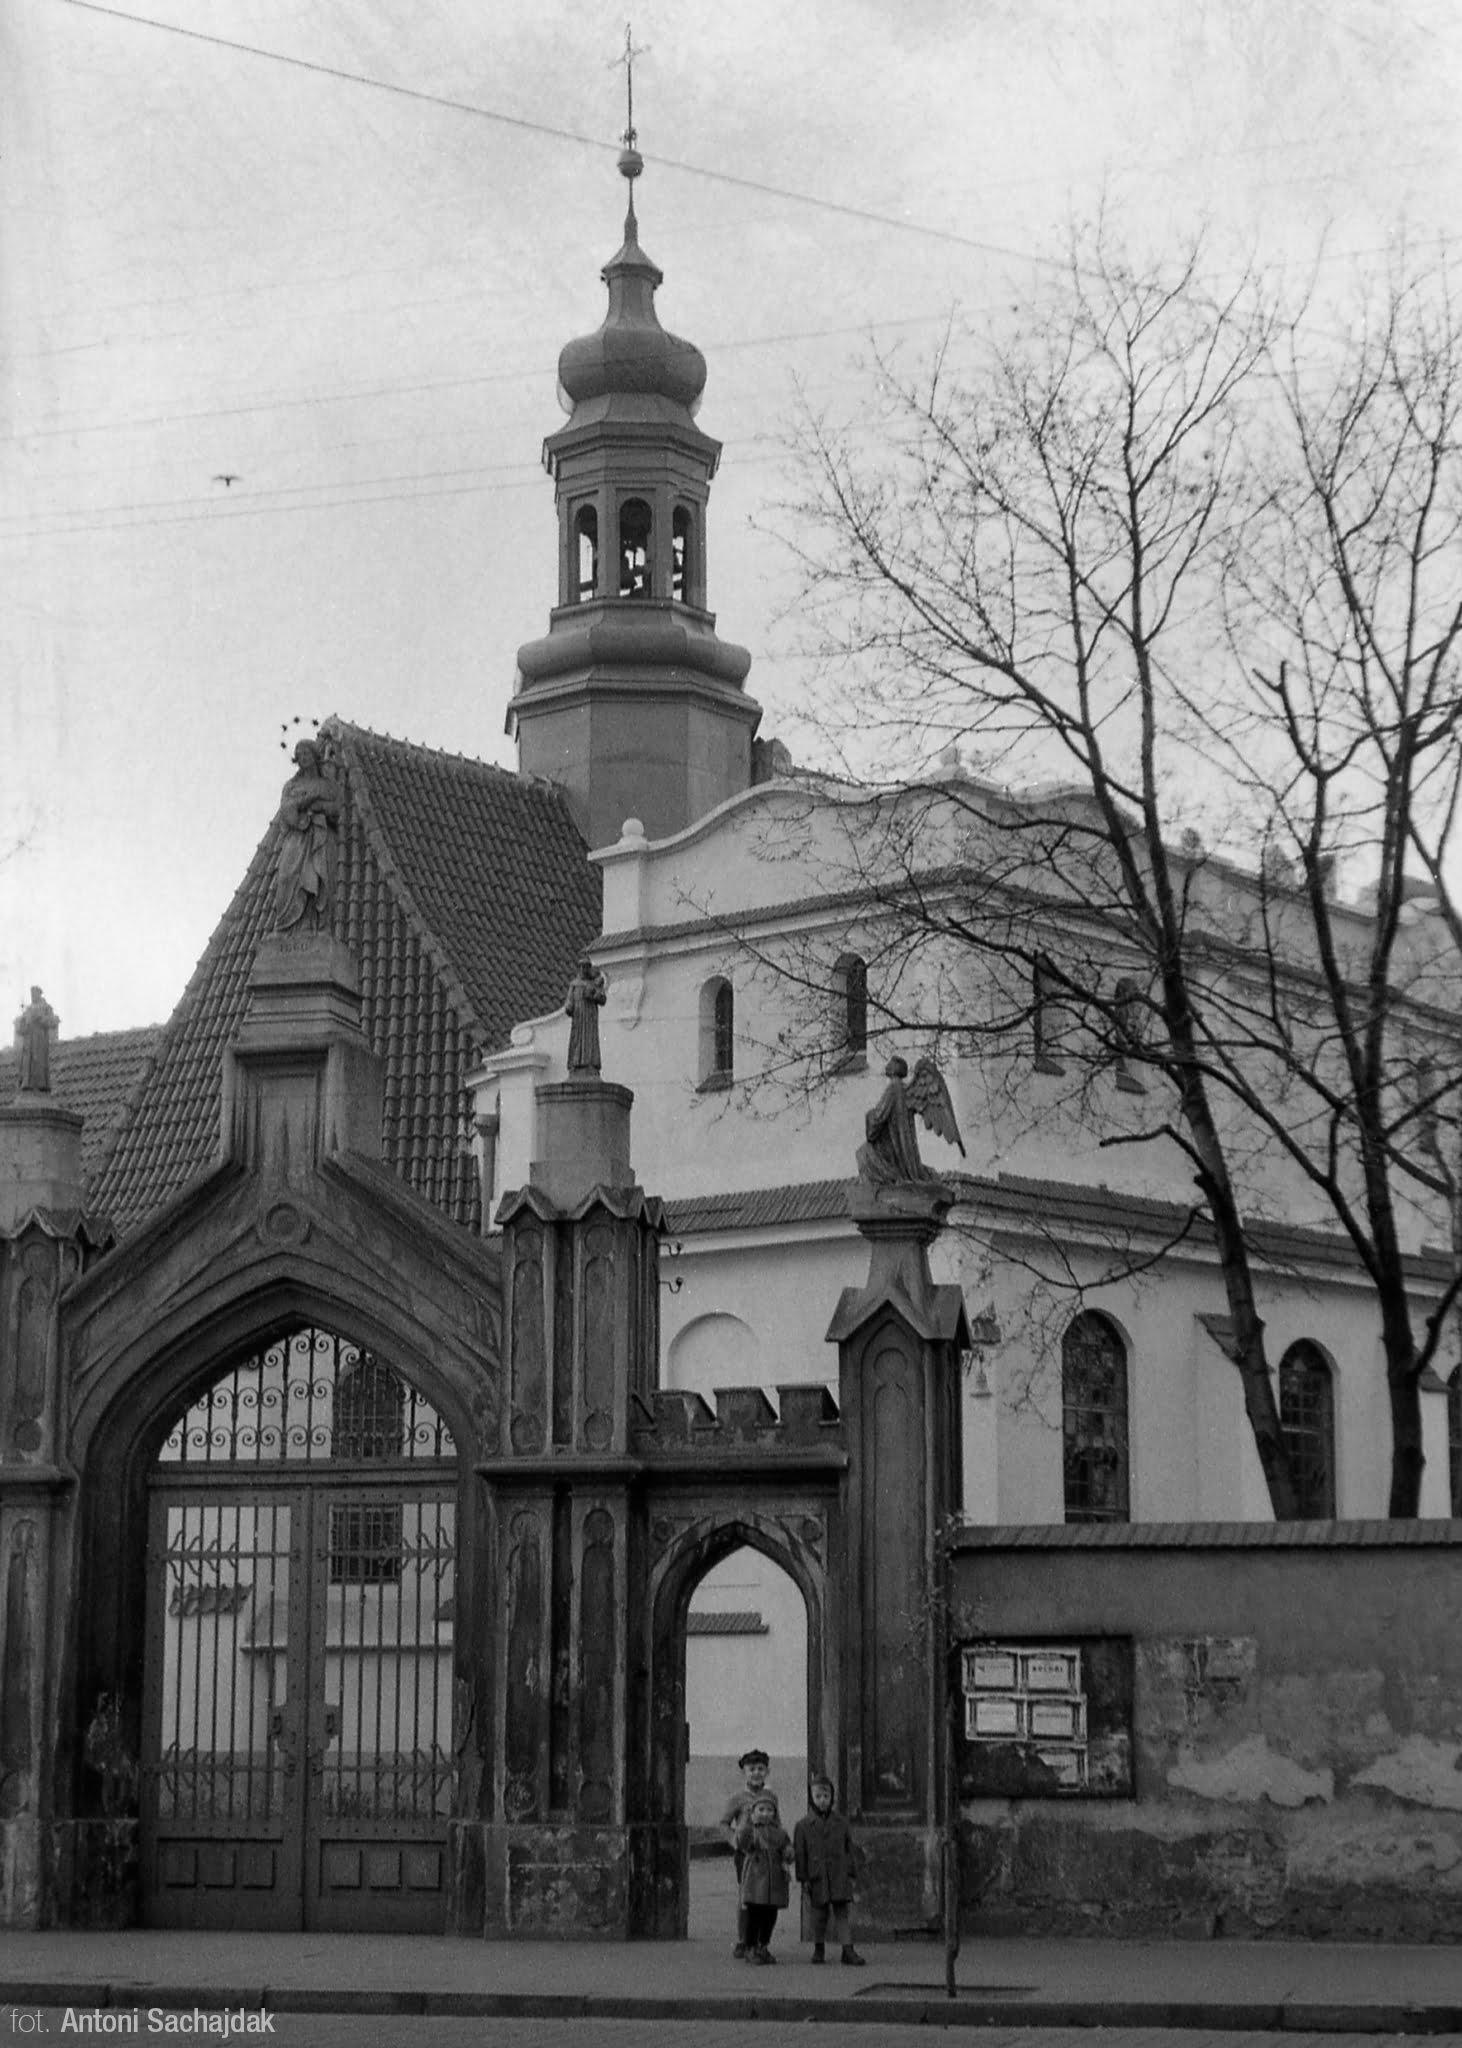 Brama klasztoru